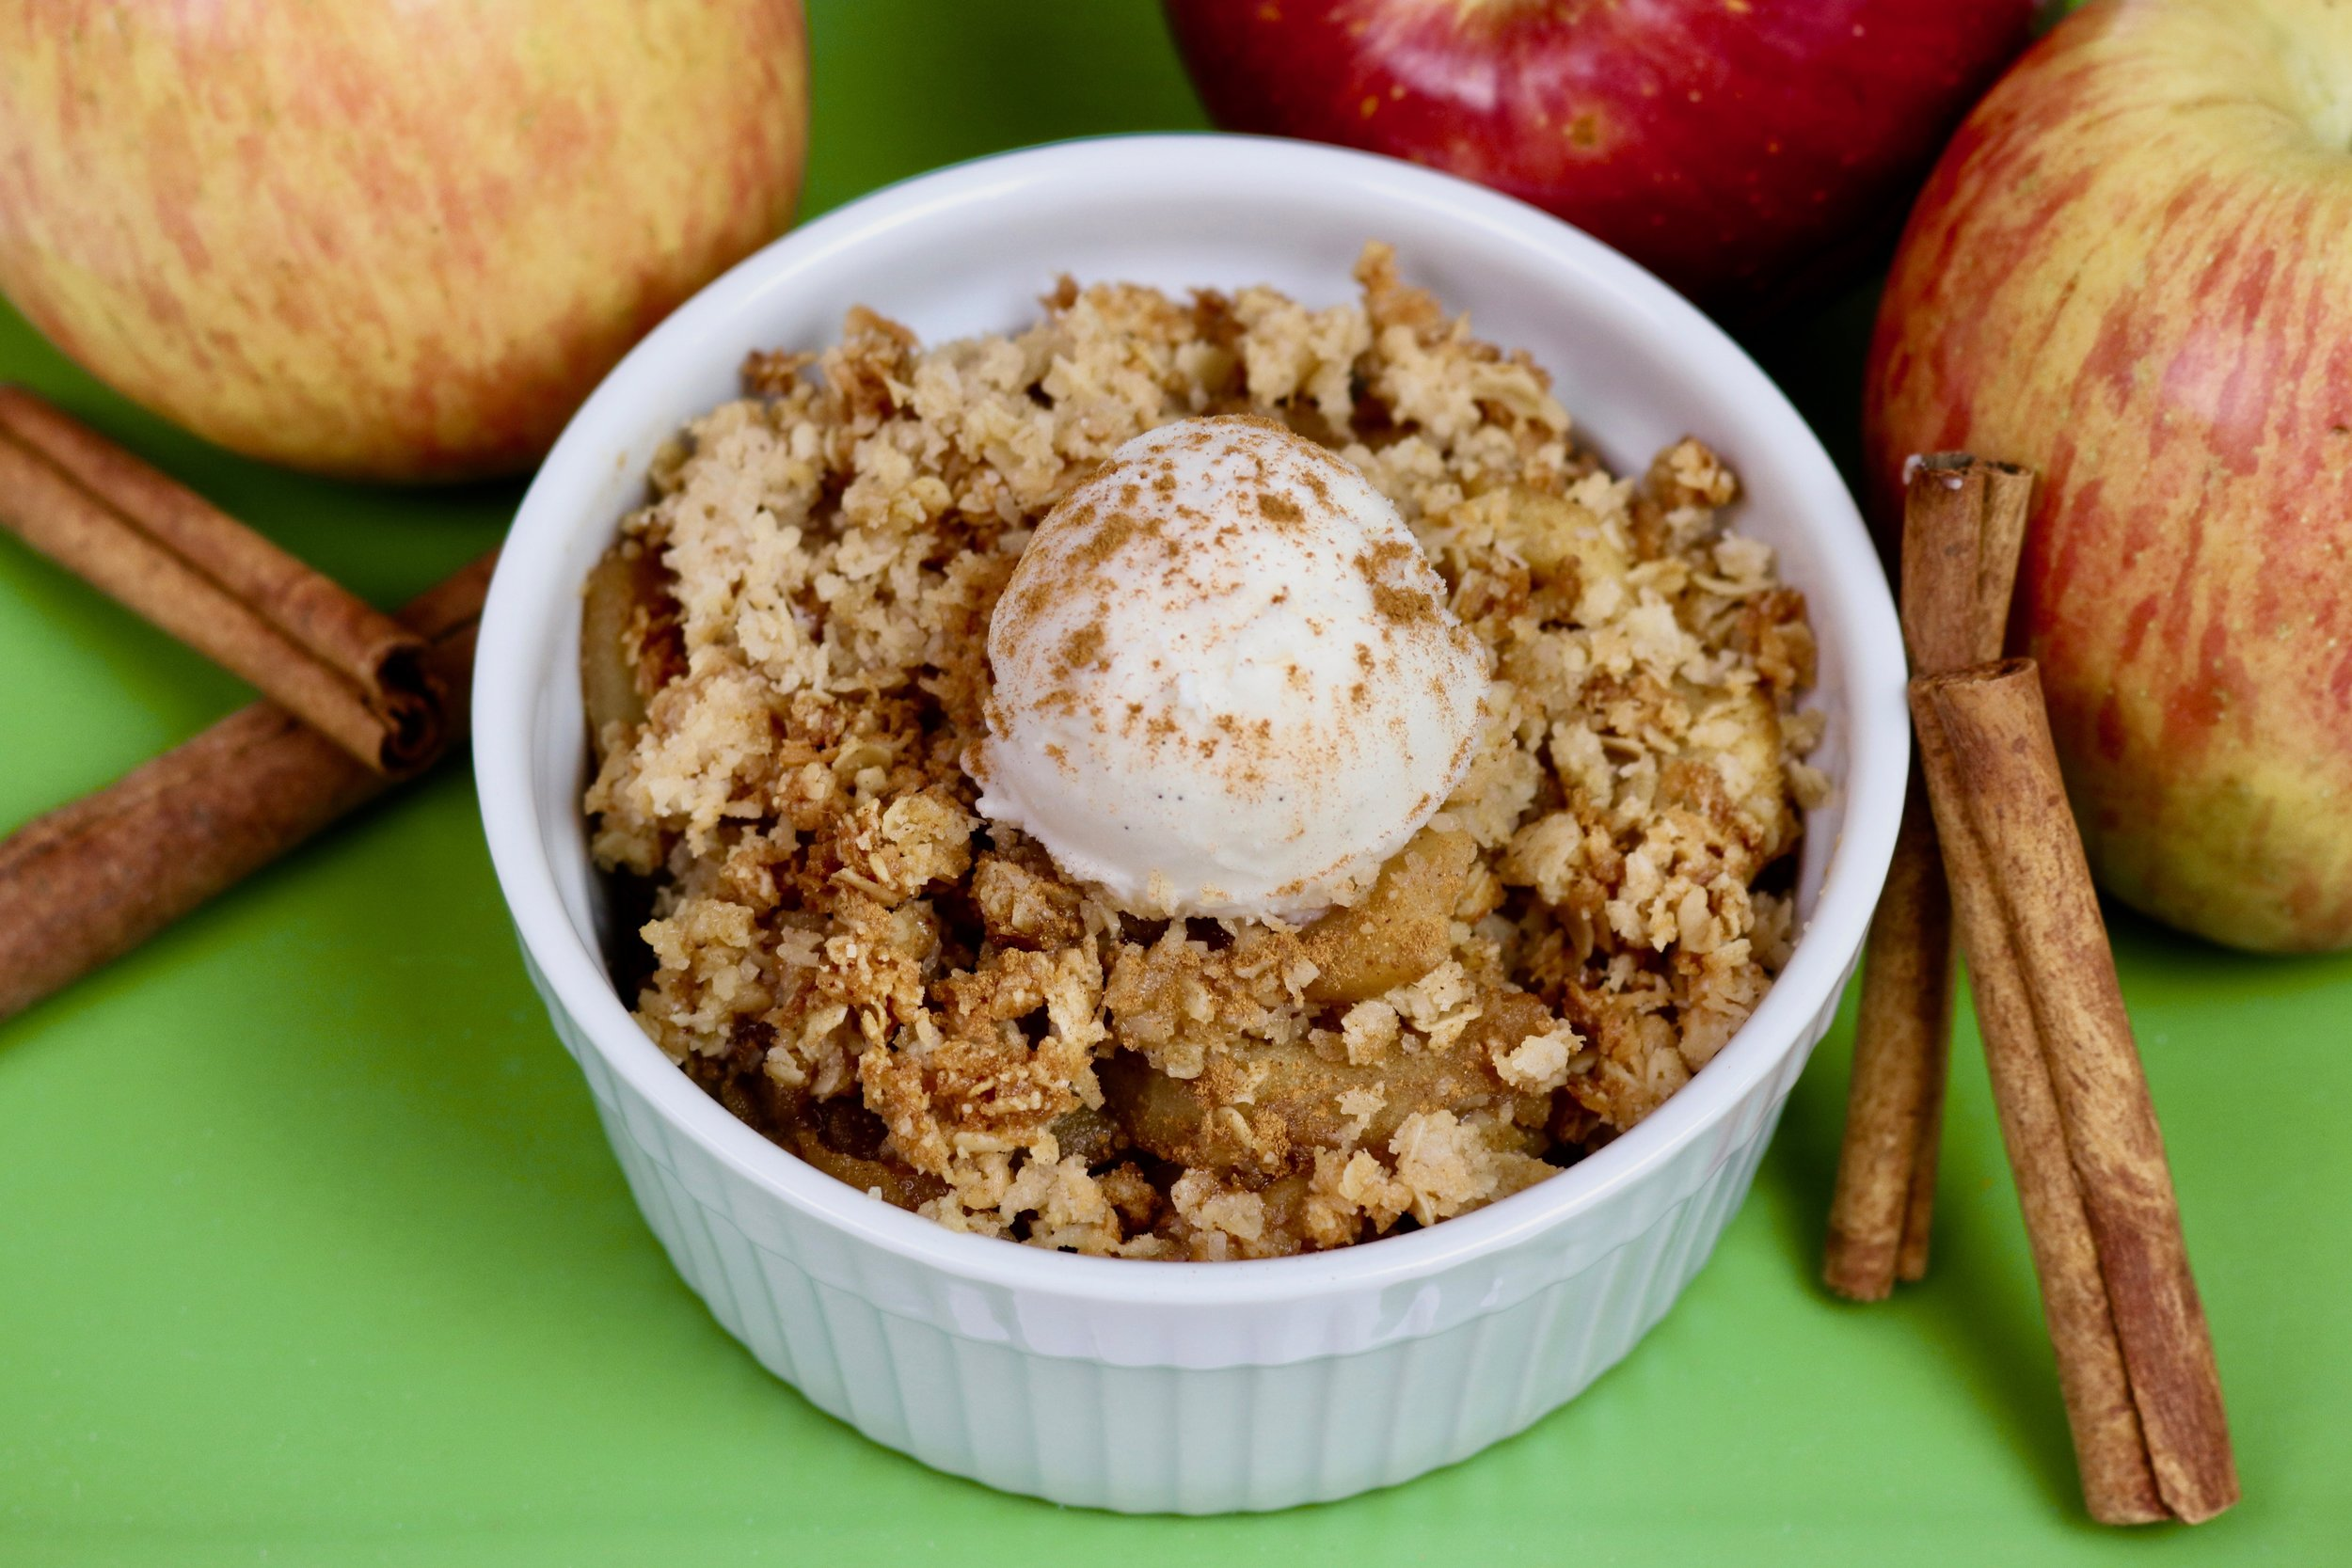 Gluten-Free Vegan Apple Crisp